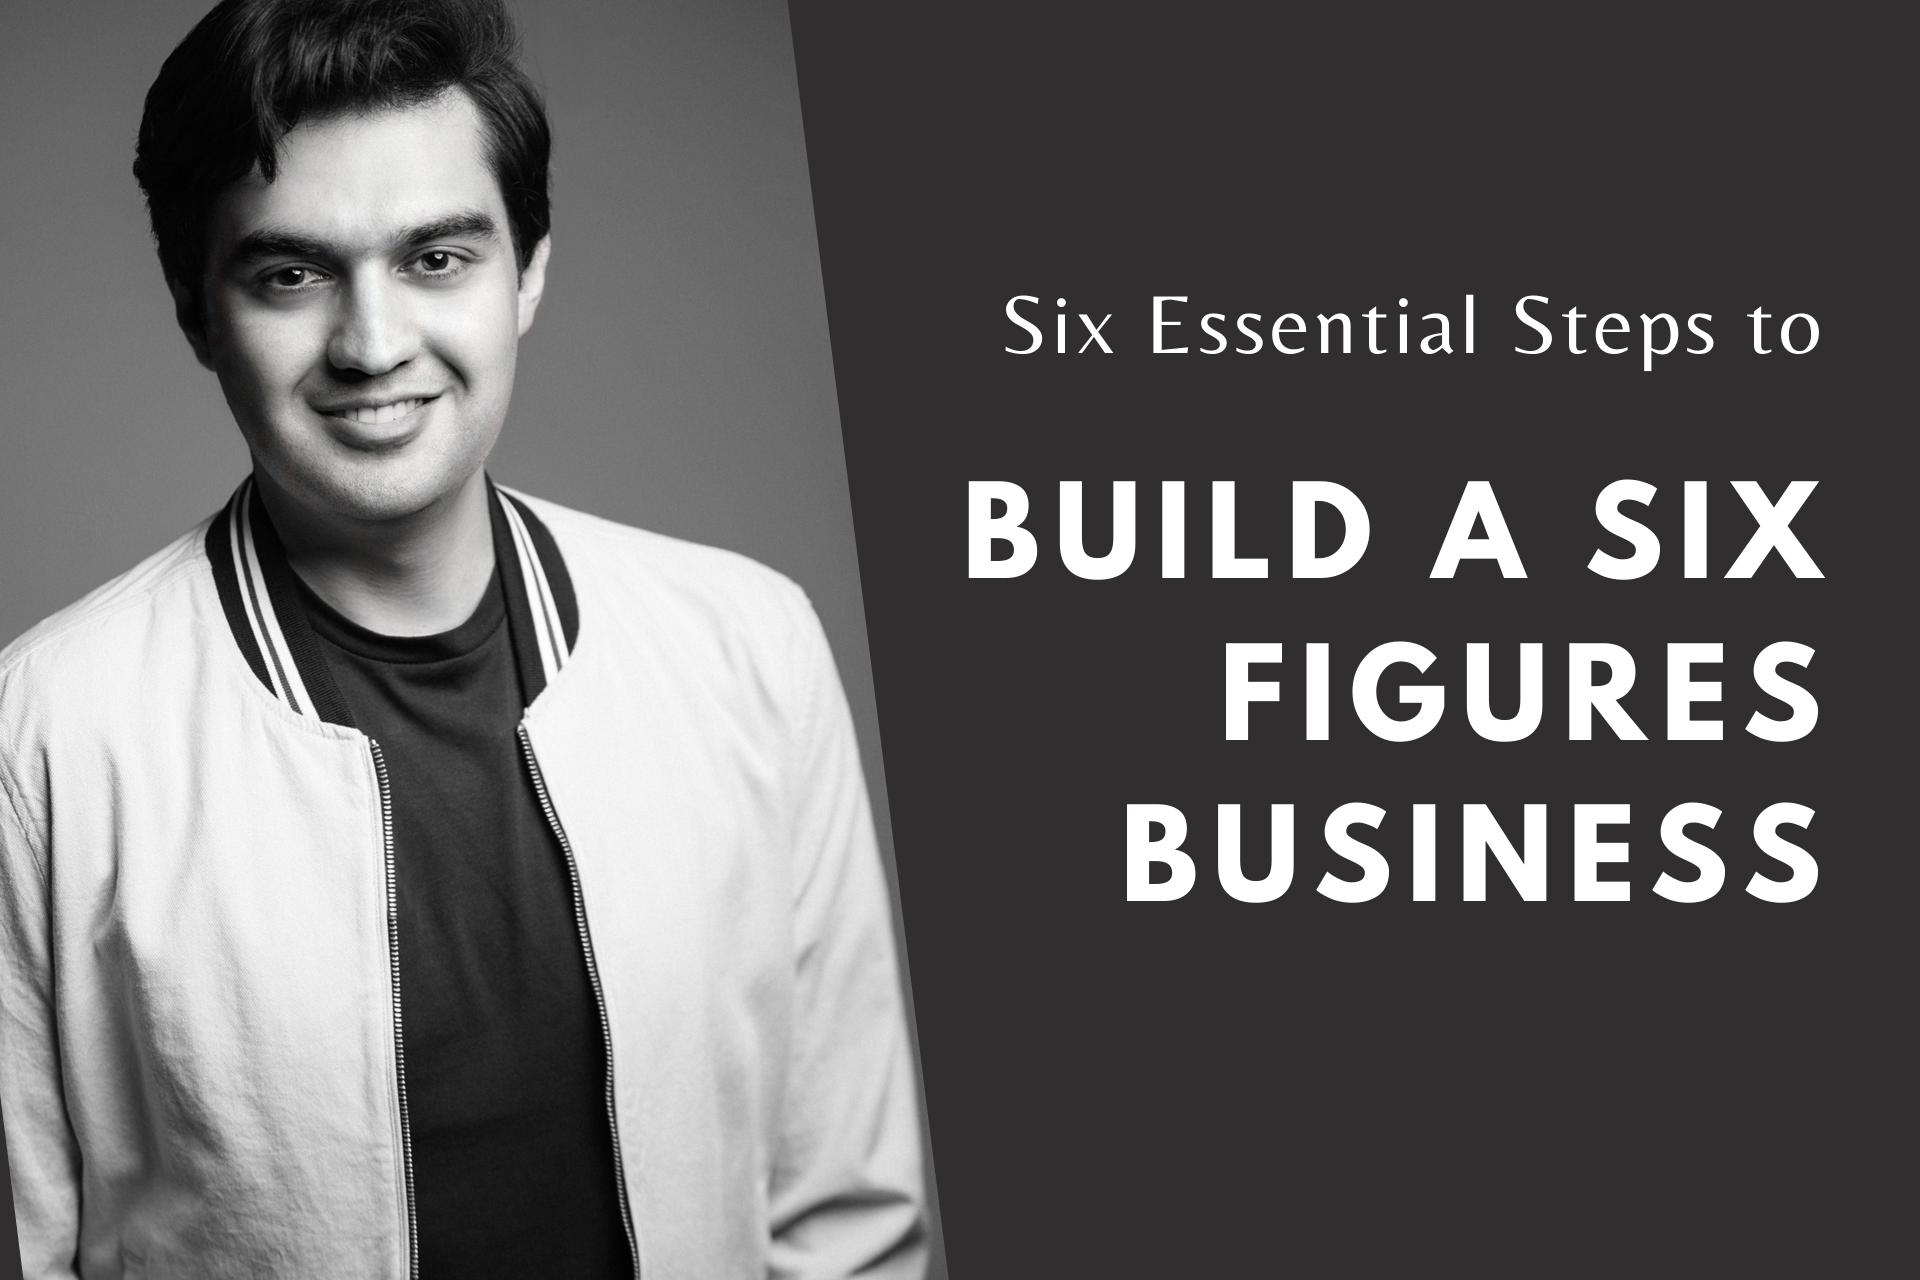 Build a Six Figures Business